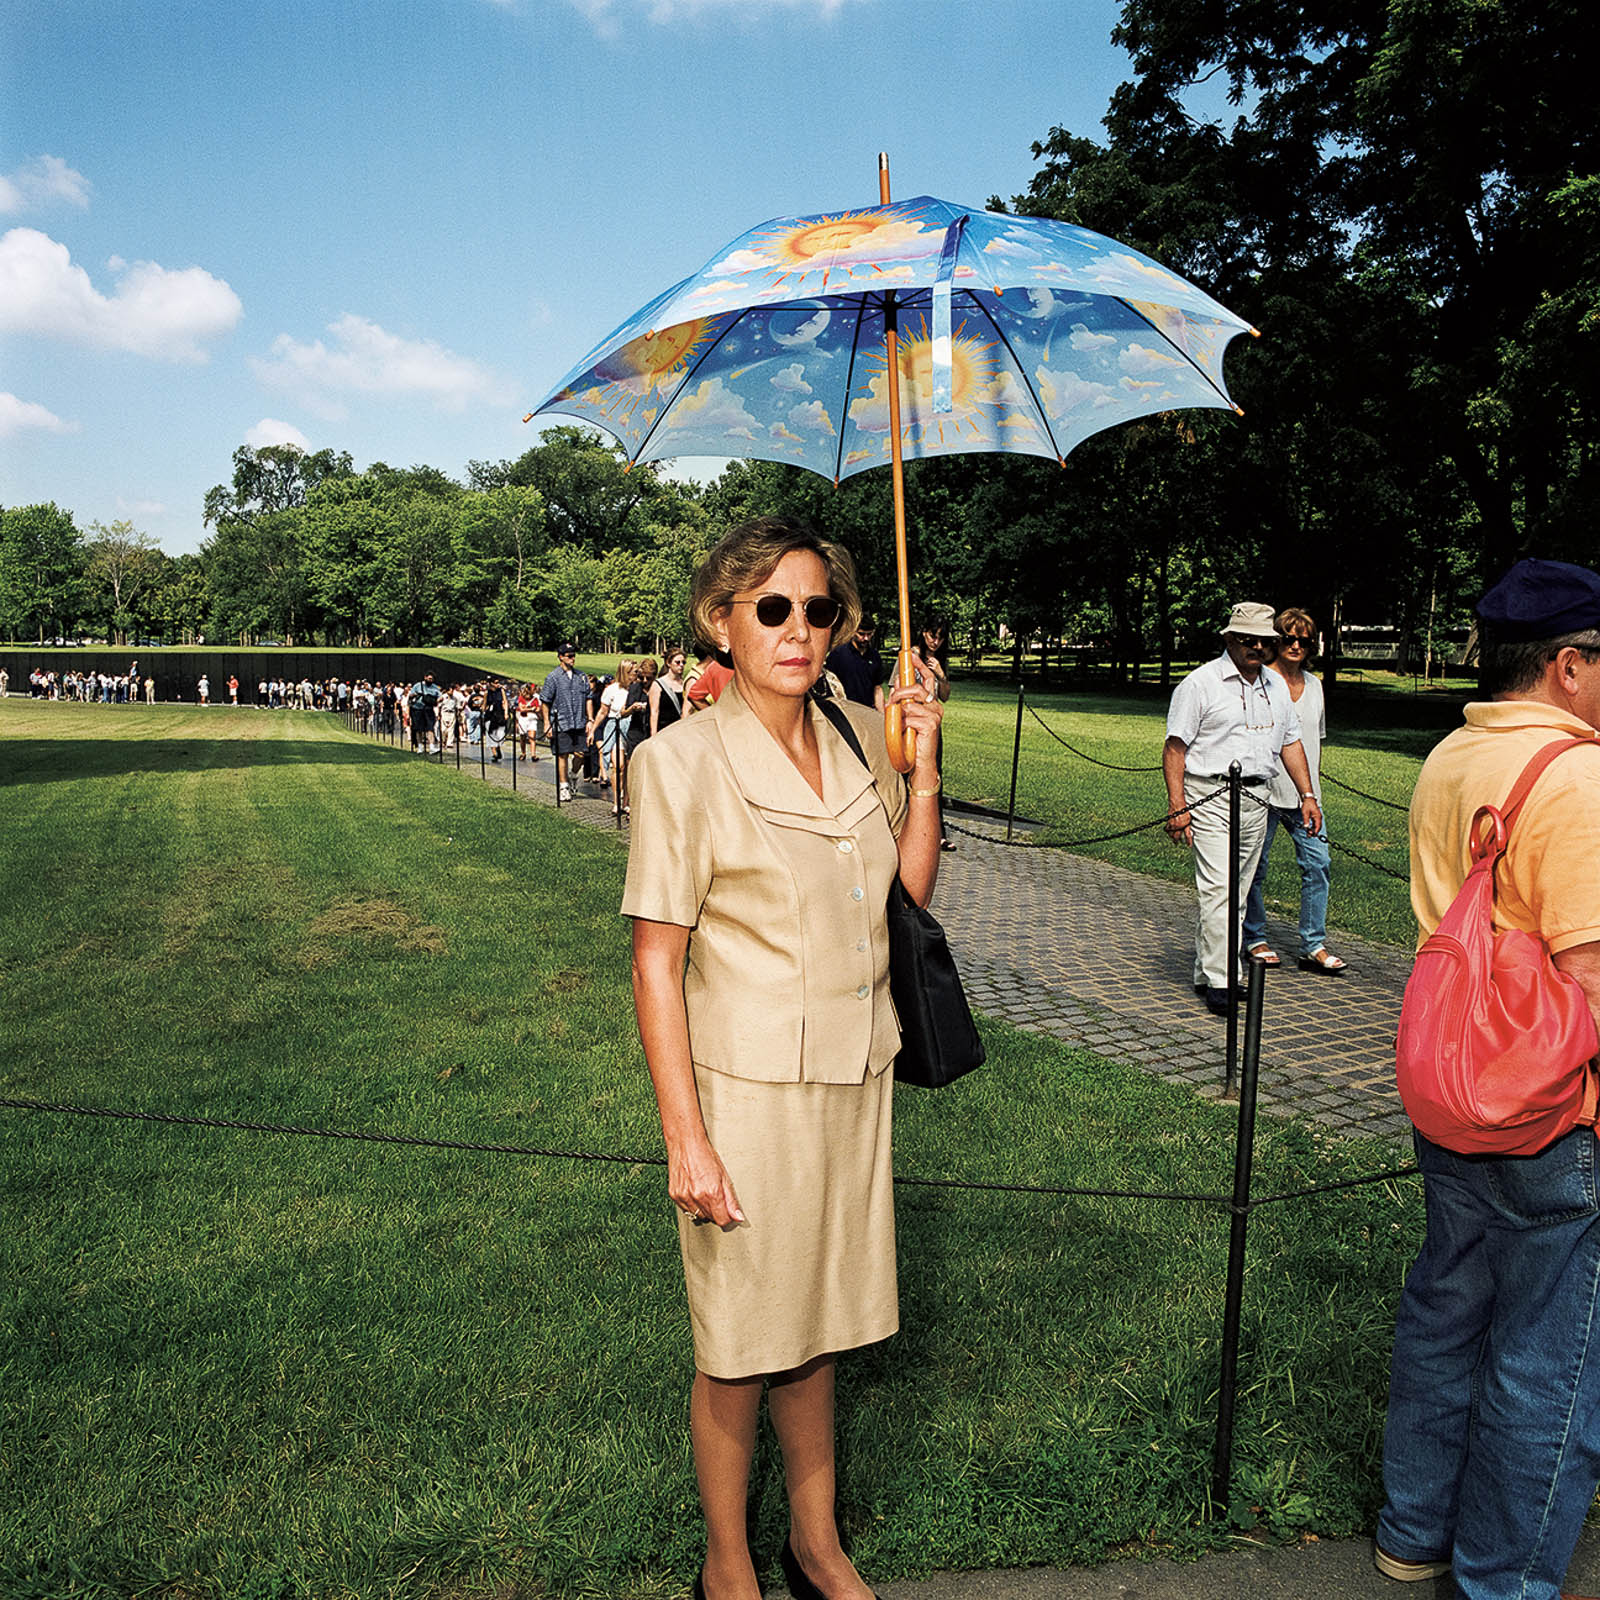 Woman at Vietnam Memorial, Washington, DC 2000